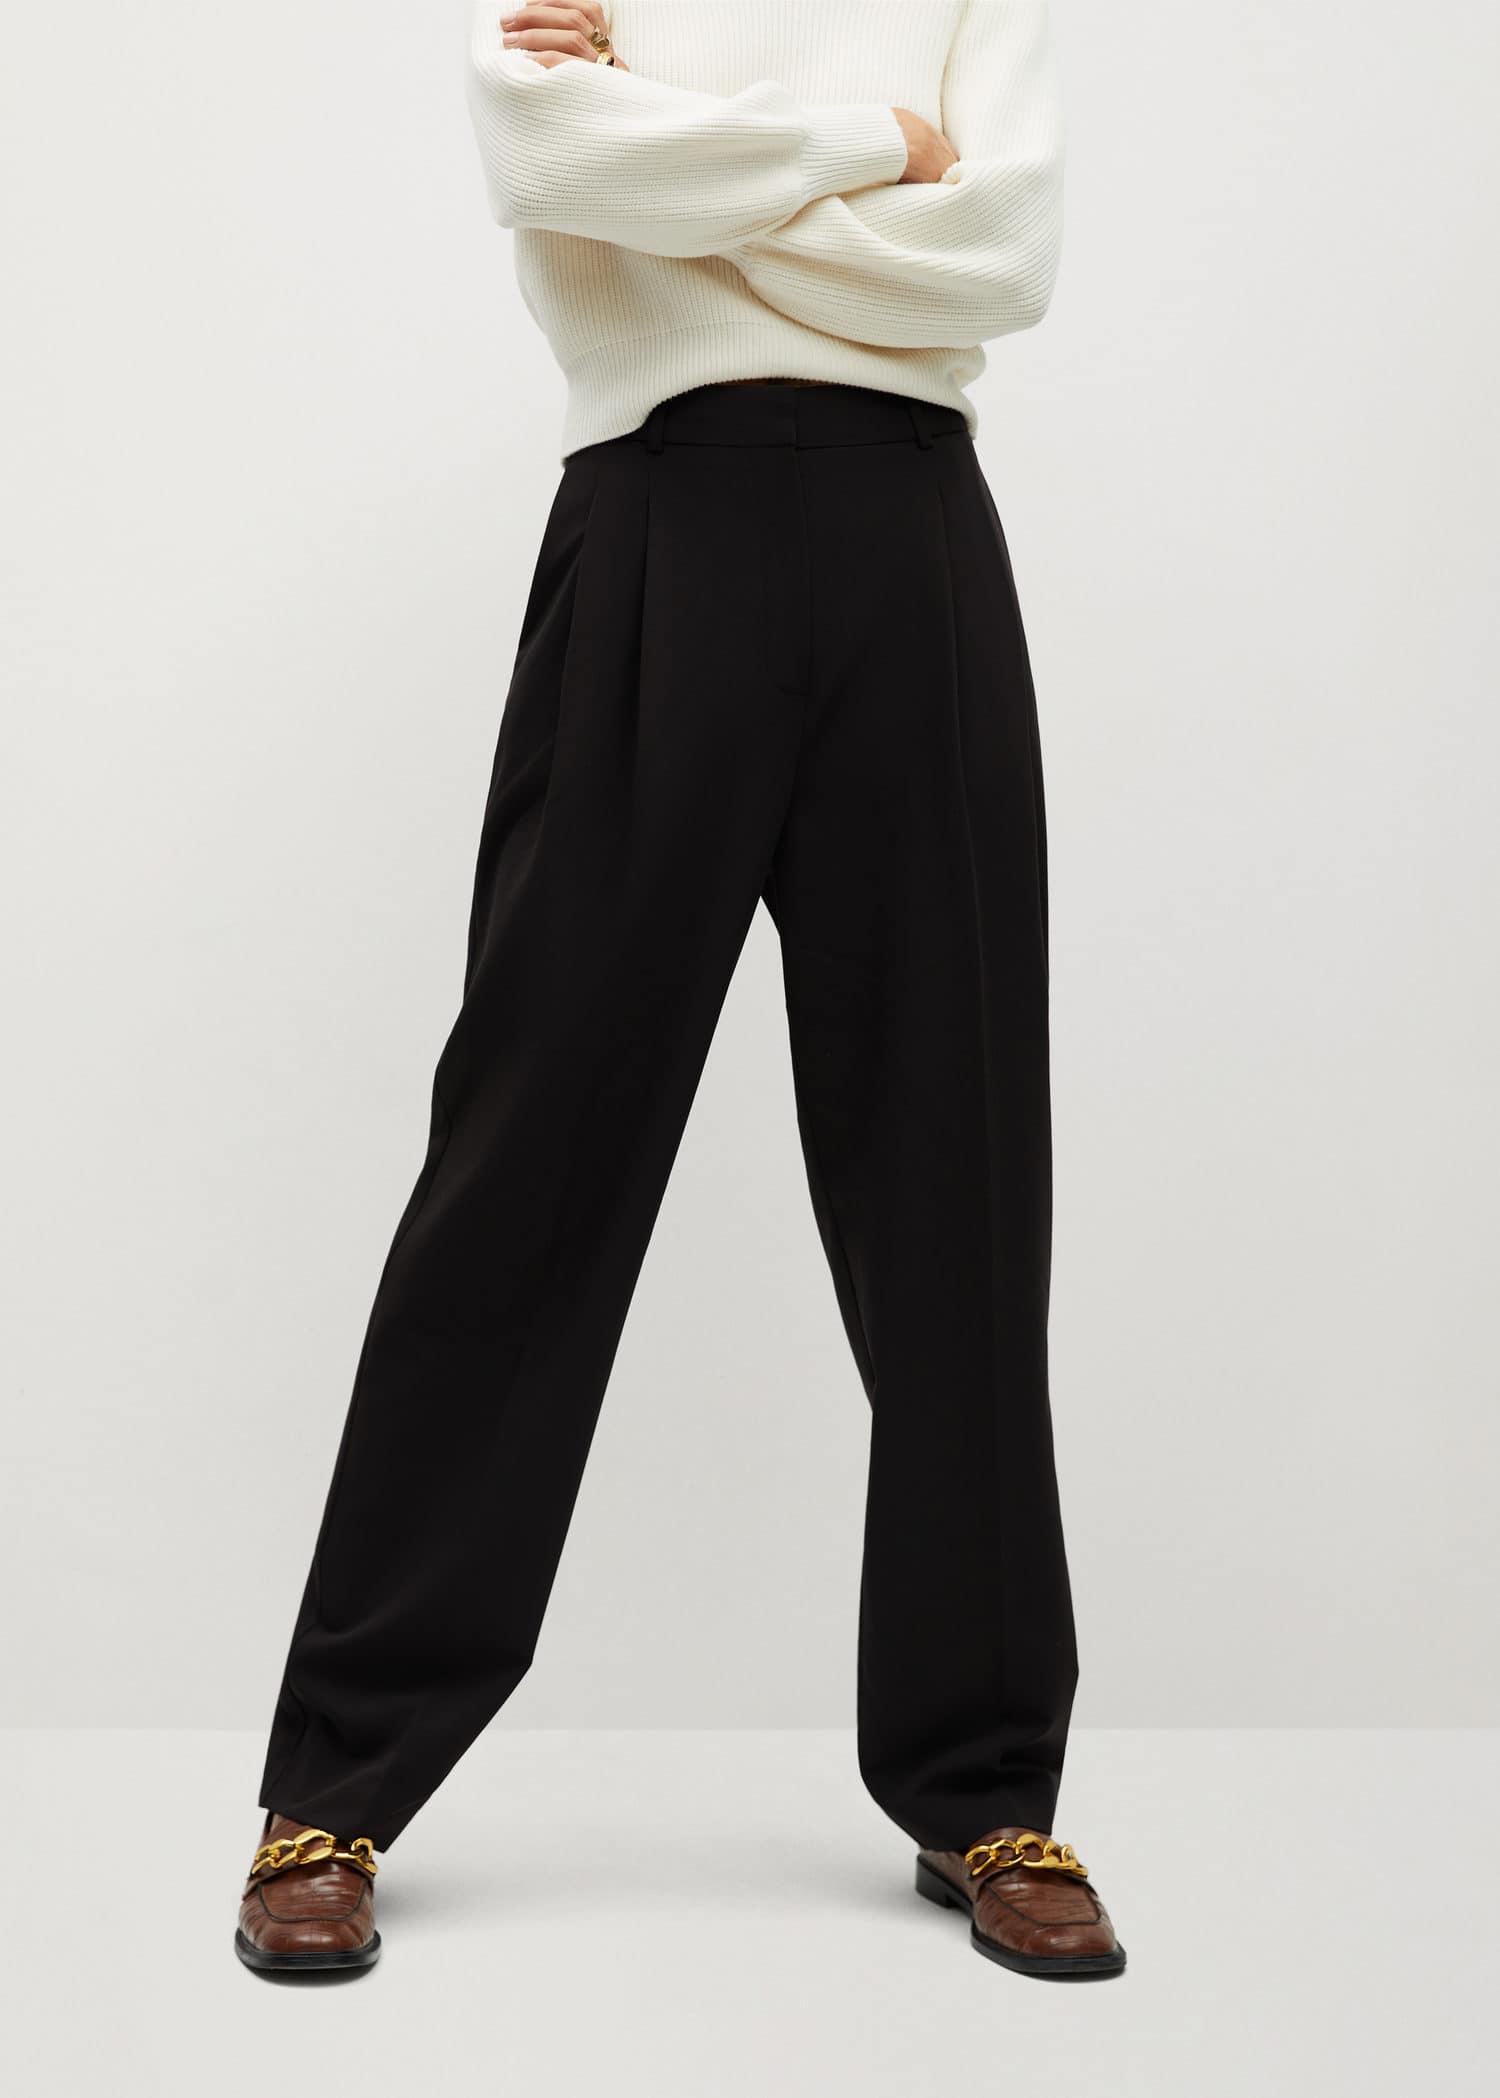 Løse bukser med struktur Damer   Mango Norge